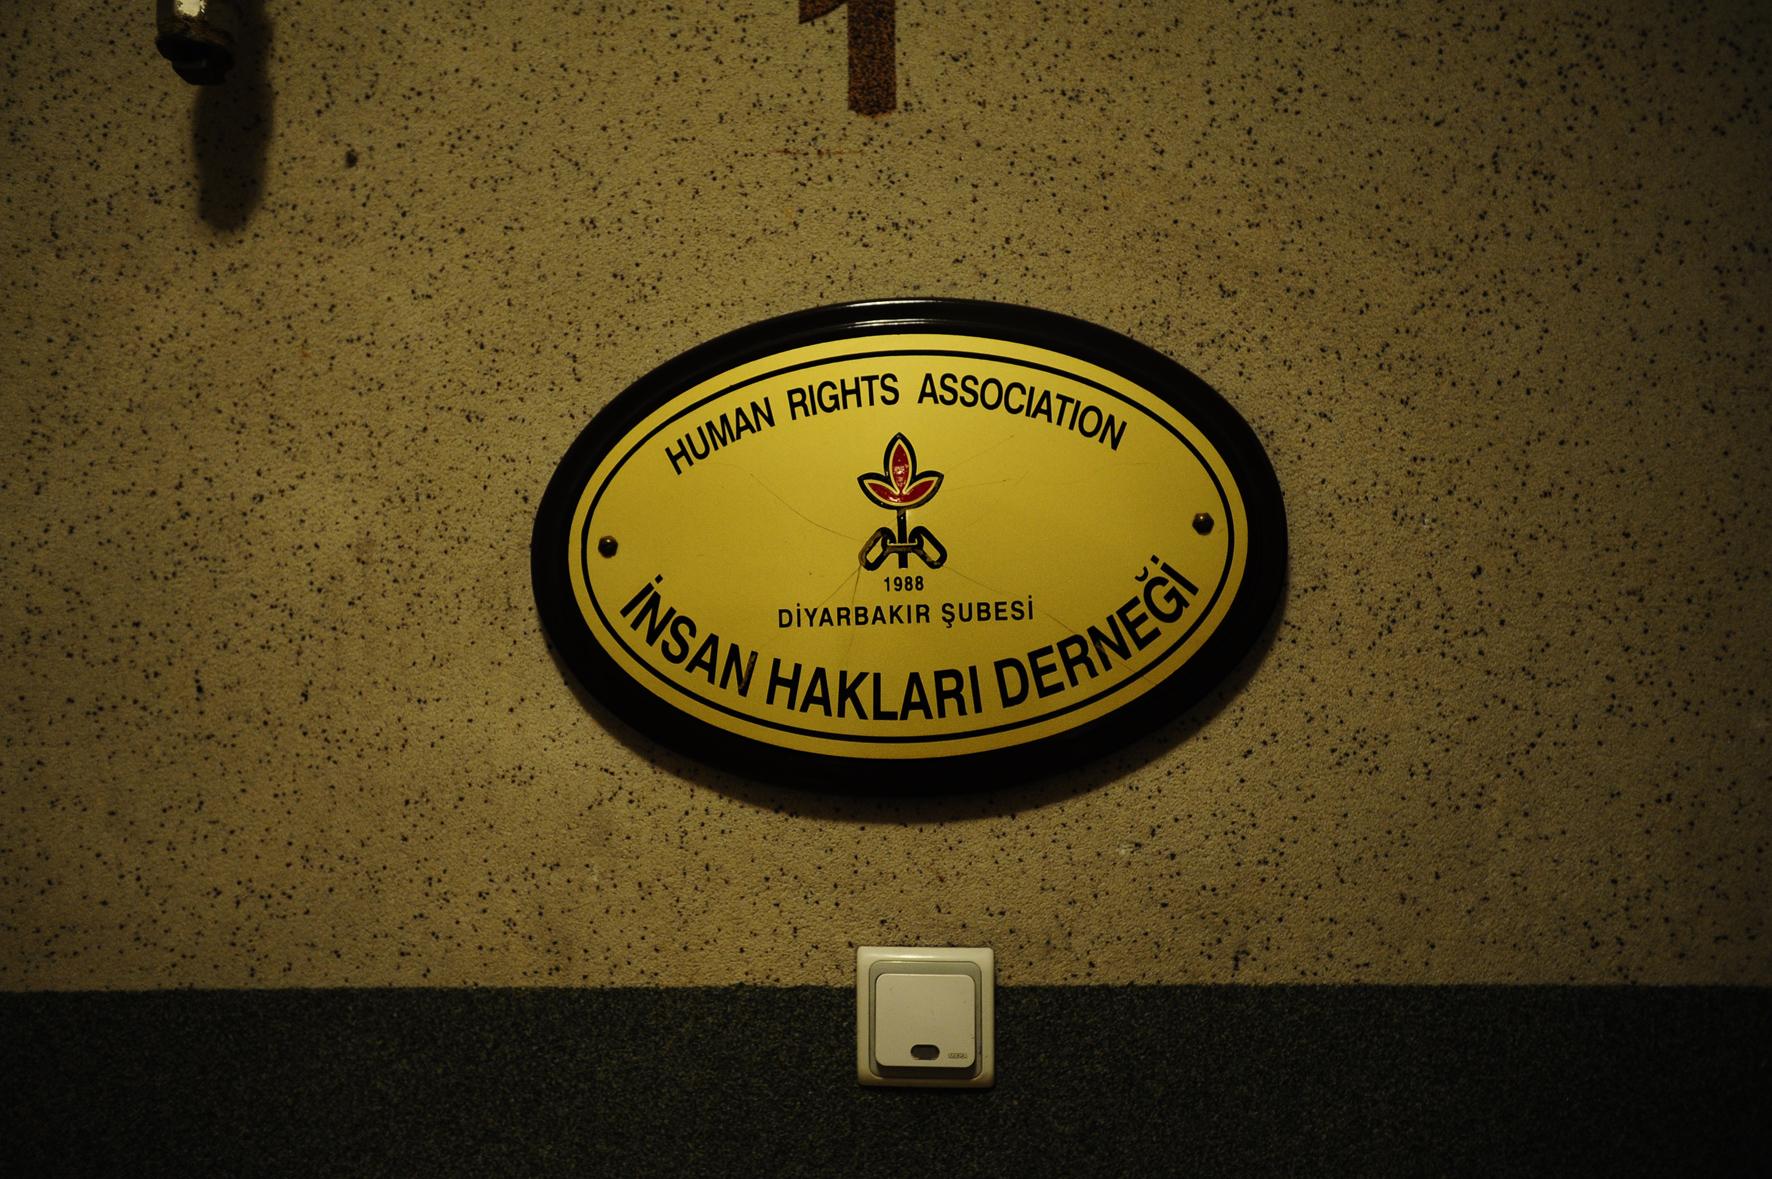 Rencontre avec l'Association des Droits de l'Homme (IHD) de Diyarbakir